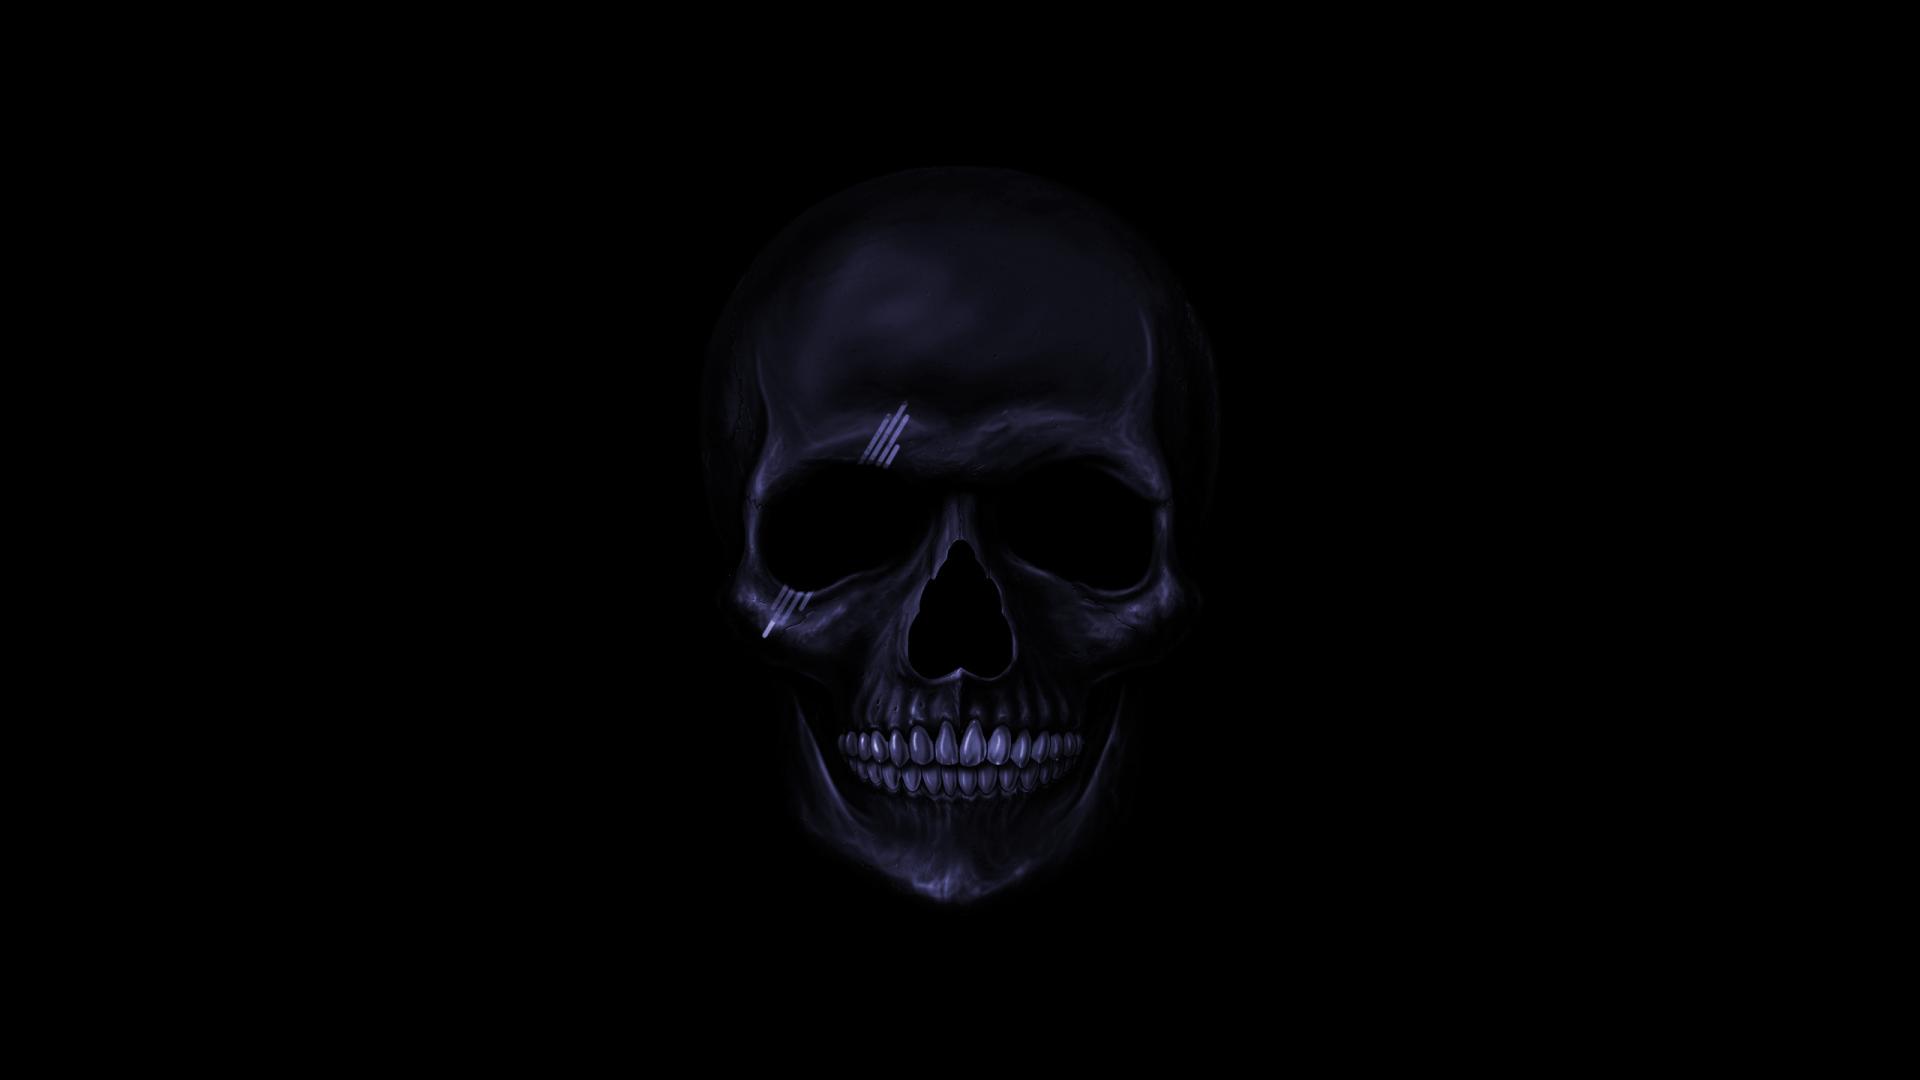 Crâne Fond d'écran HD | Arrière-Plan | 1920x1080 | ID:429418 - Wallpaper Abyss